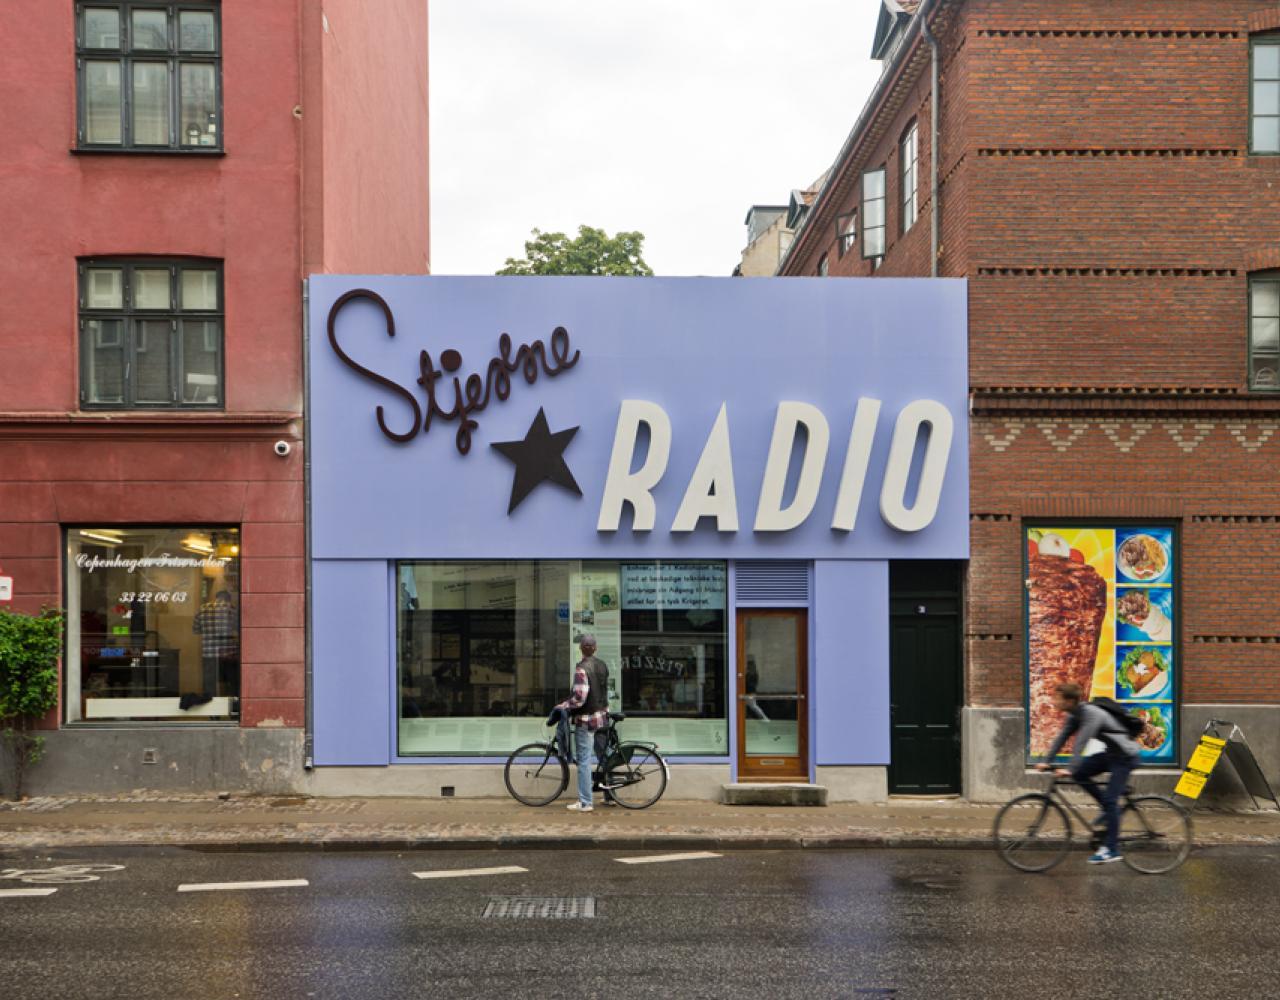 stjerne radio istedgade 31